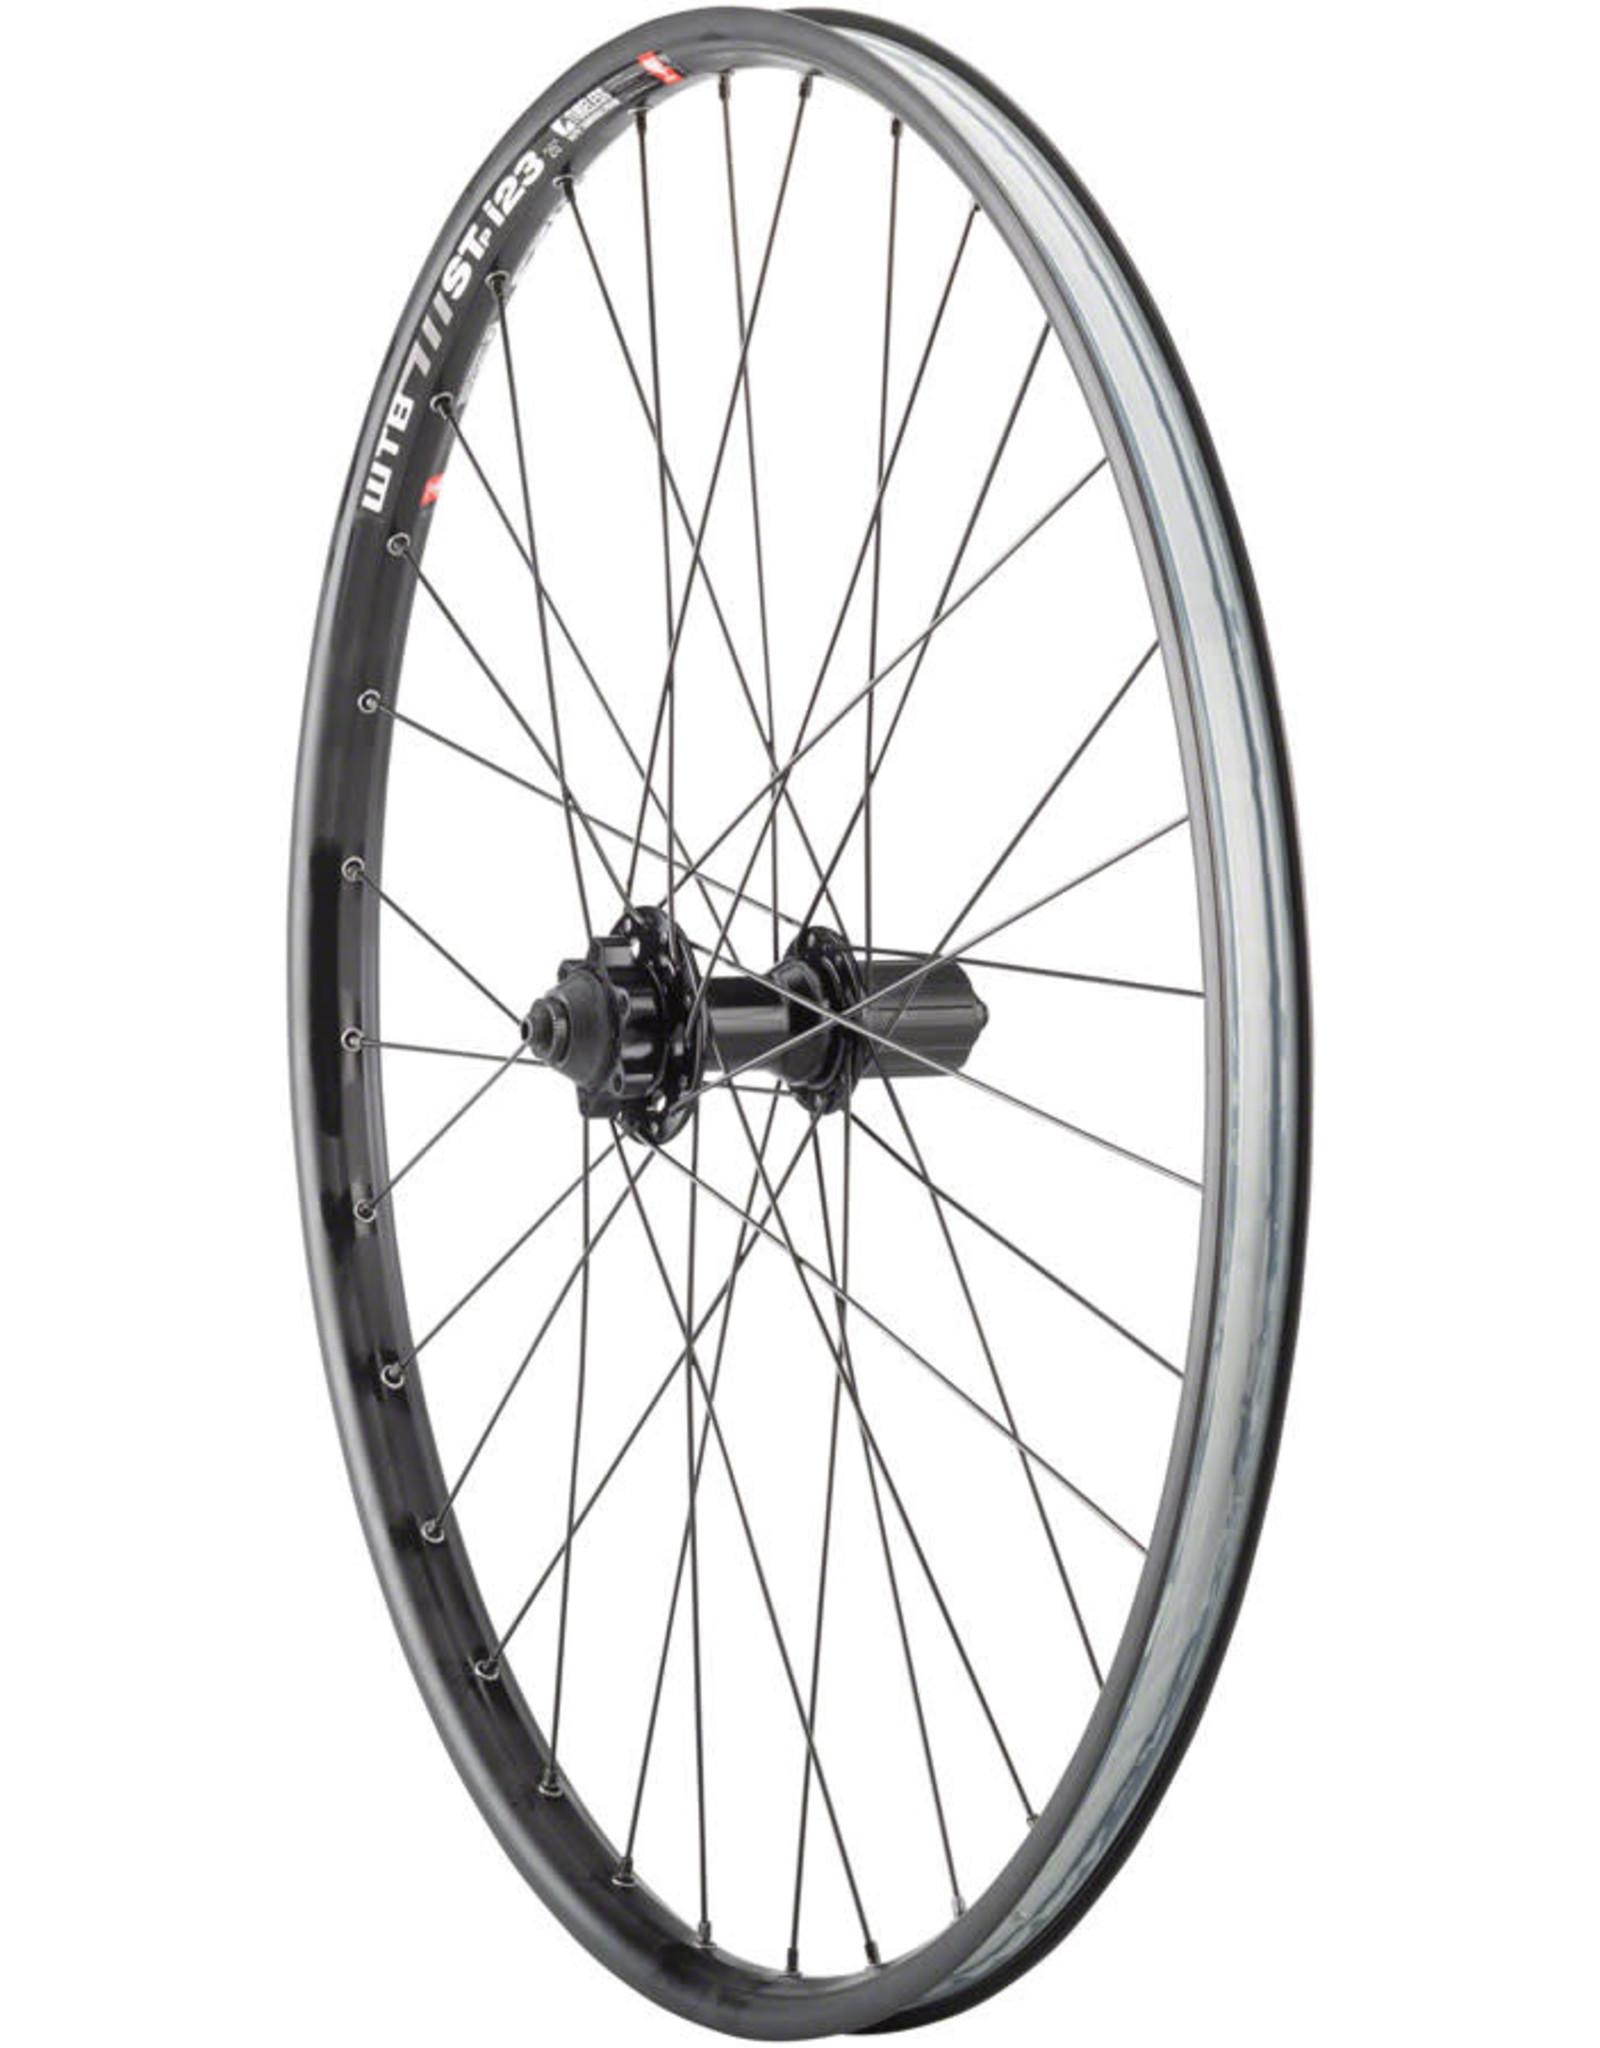 "Quality Wheels WTB ST i23 TCS Disc - 26"", QR x 135mm, 6-Bolt, HG 10, Black, Rear Wheel"